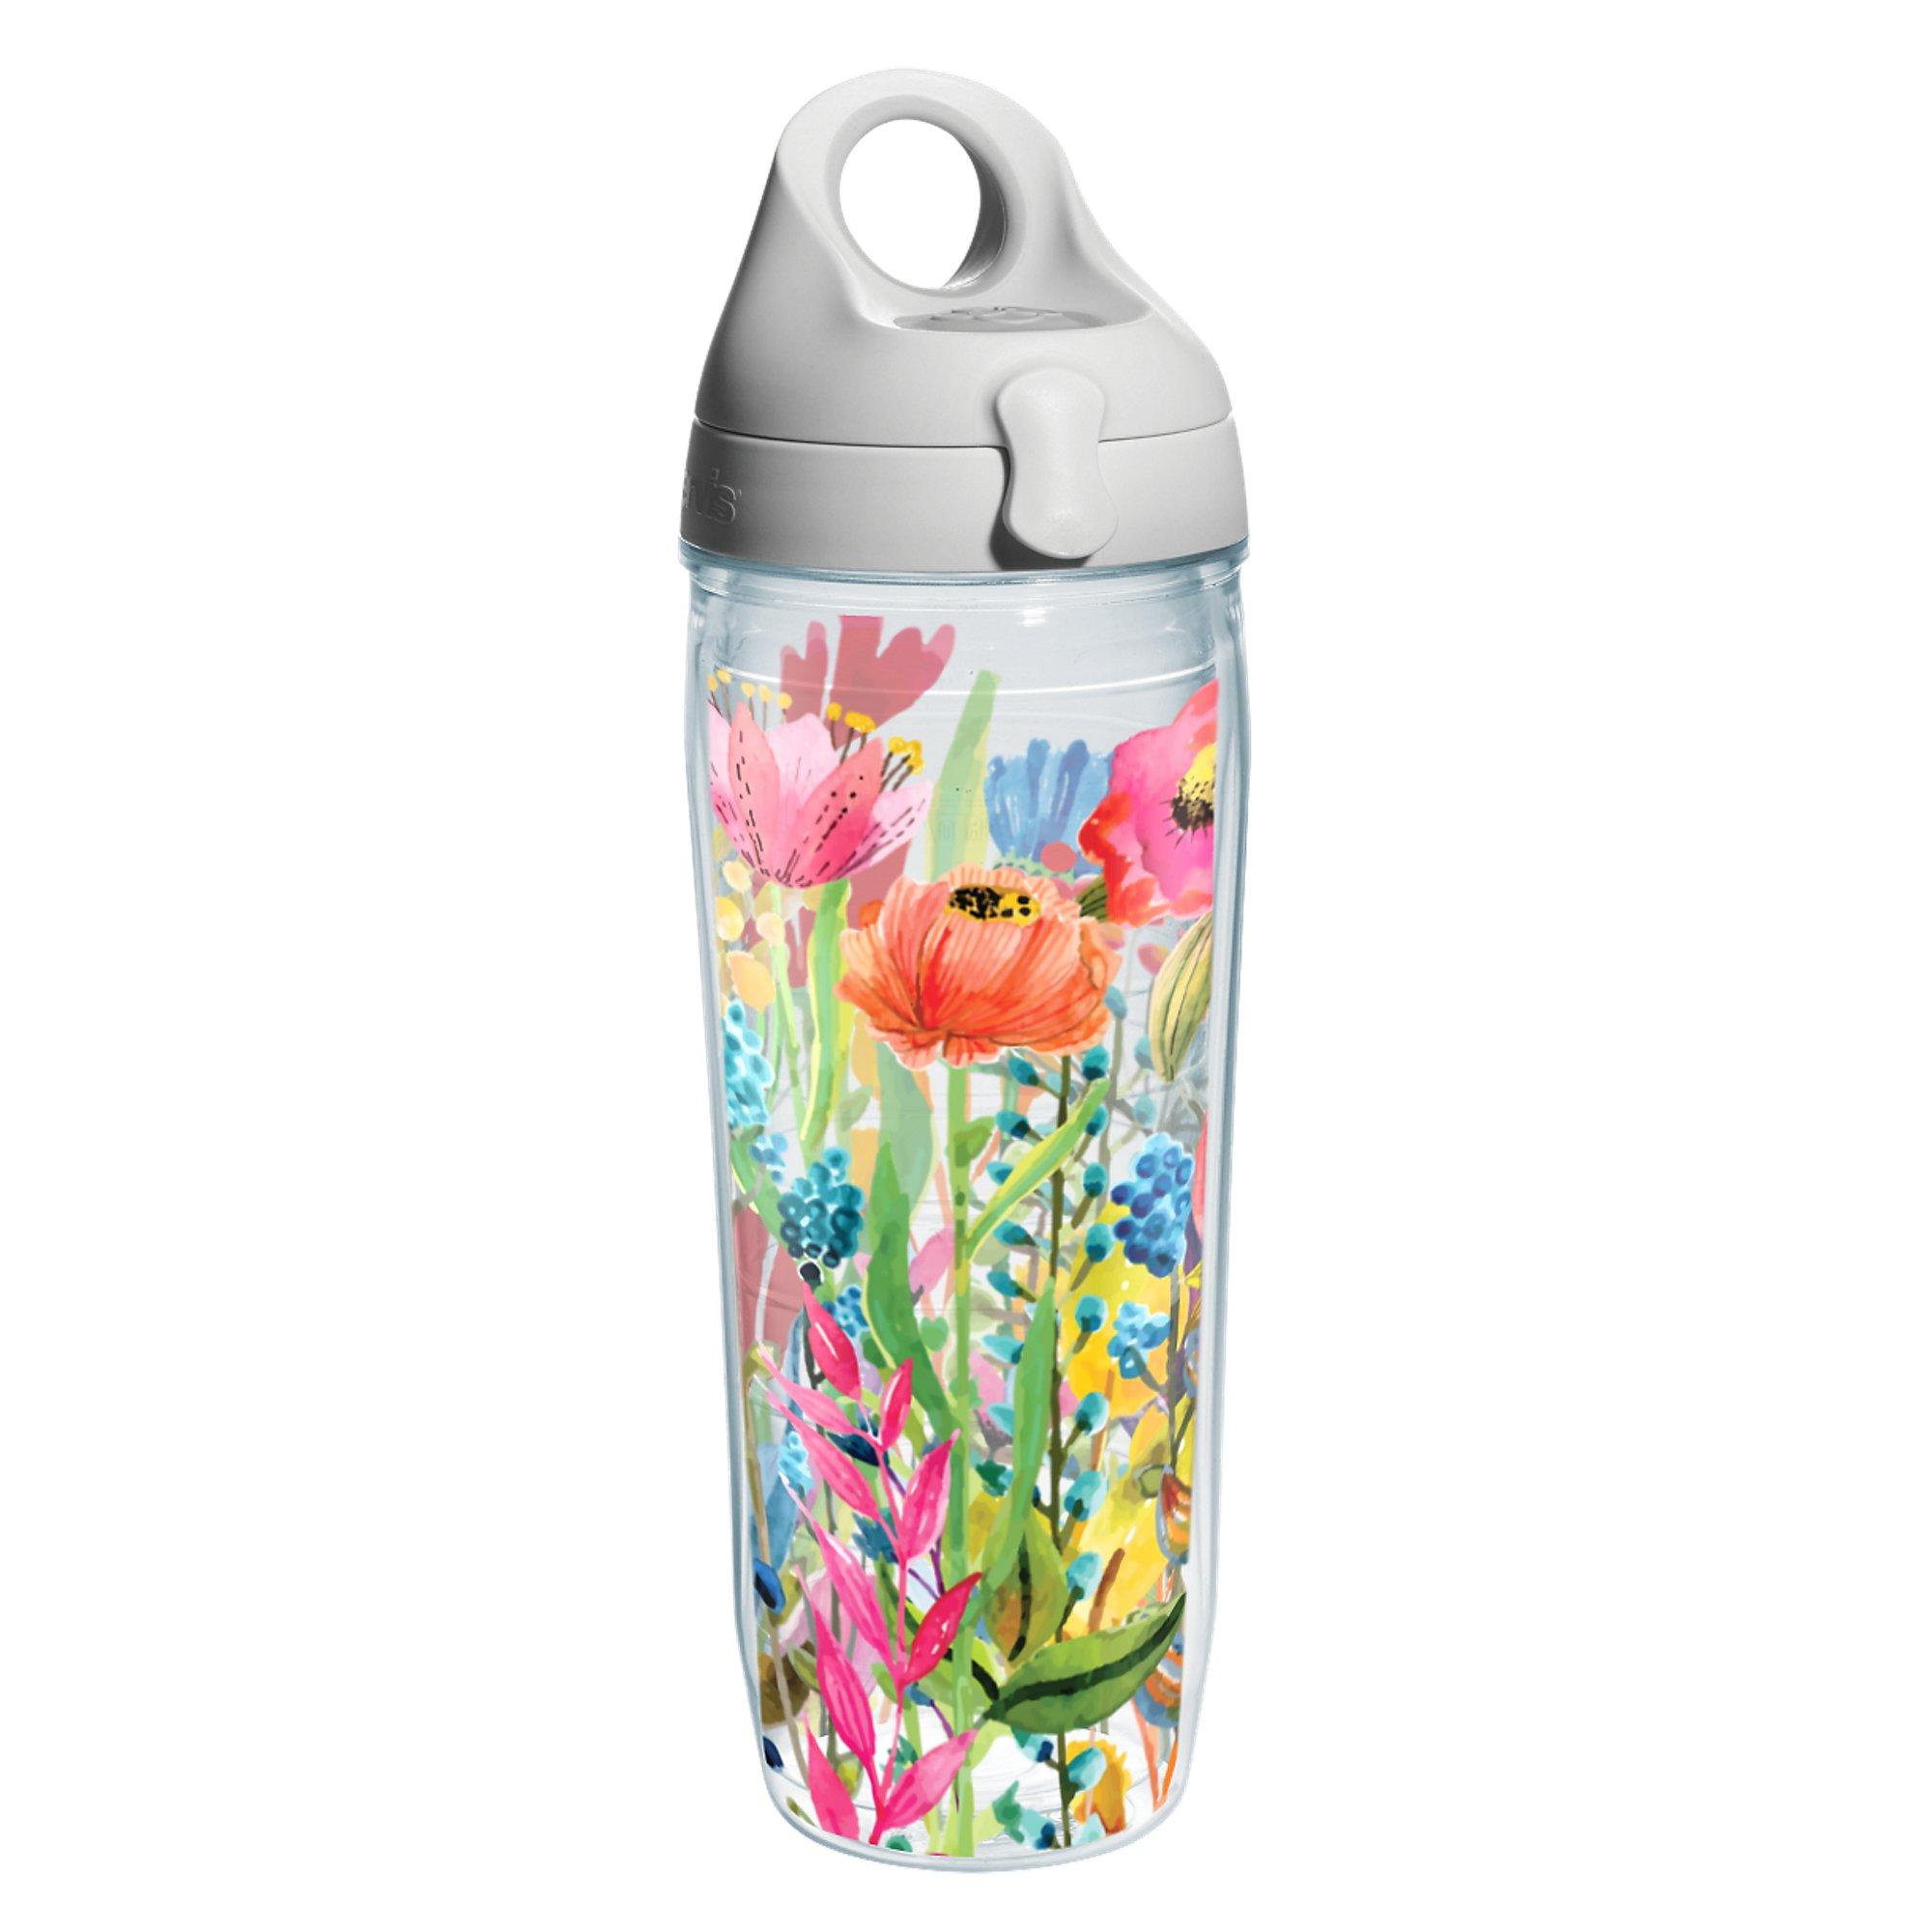 Tervis 1208550 Watercolor Wildflowers Wrap Water Bottle with Grey Water Bath Lid, 24 oz, Clear